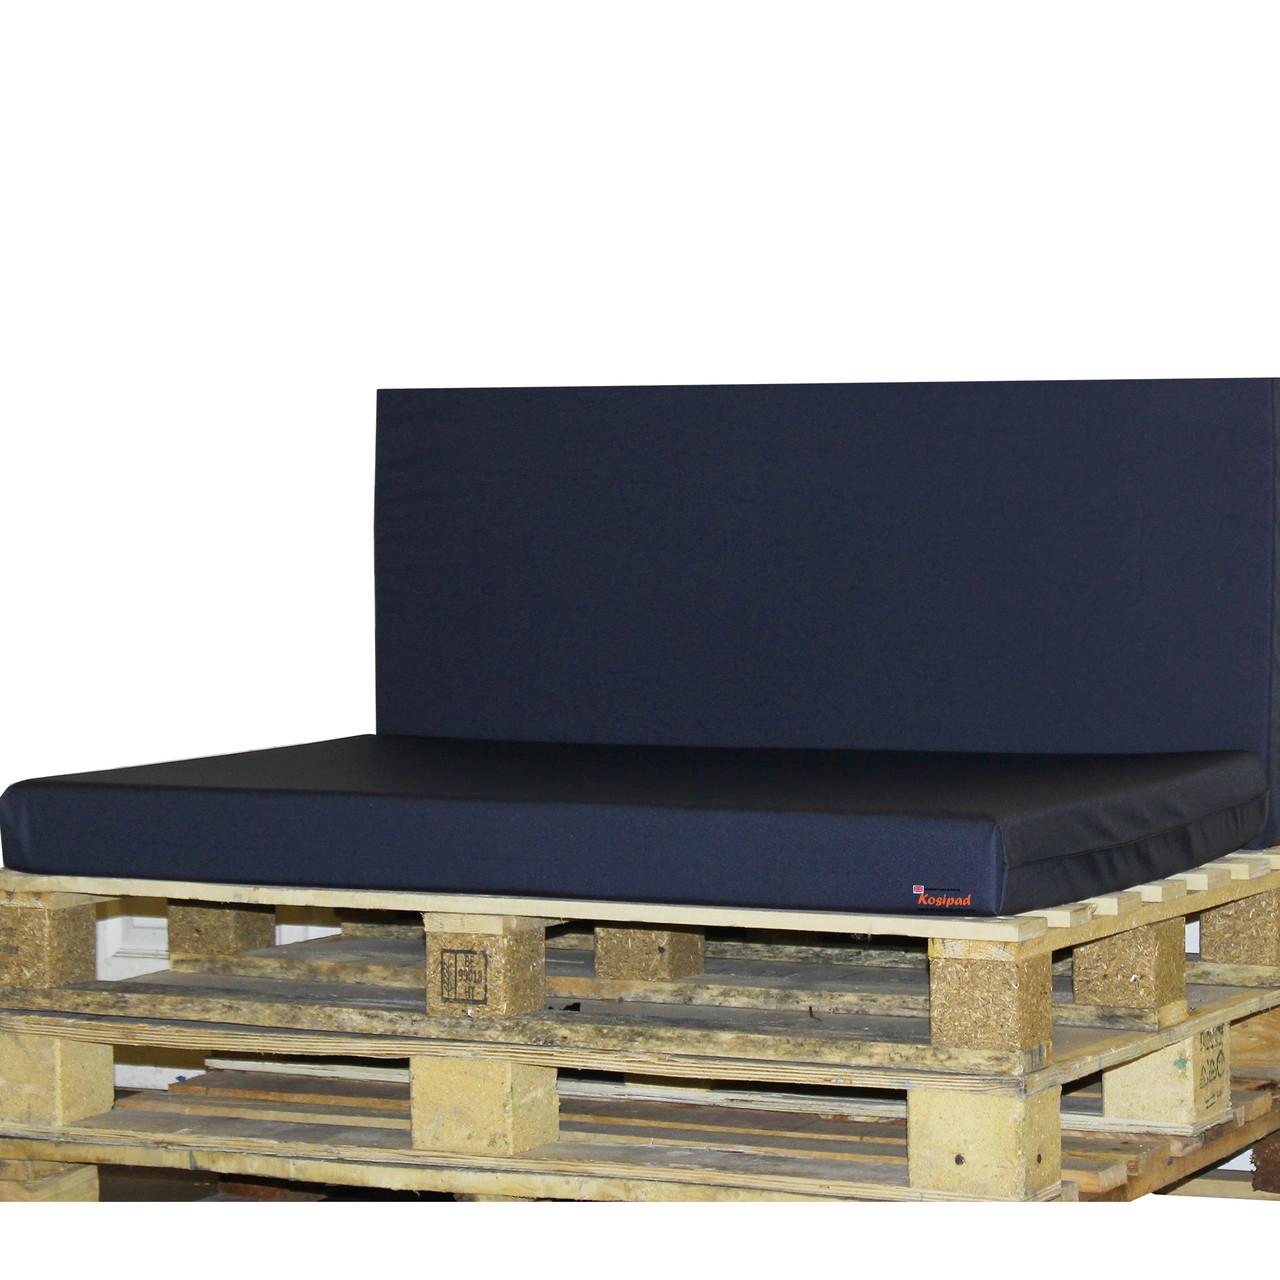 Kosipad Navy Blue foam cushion pads seating Cushions for Euro Pallets